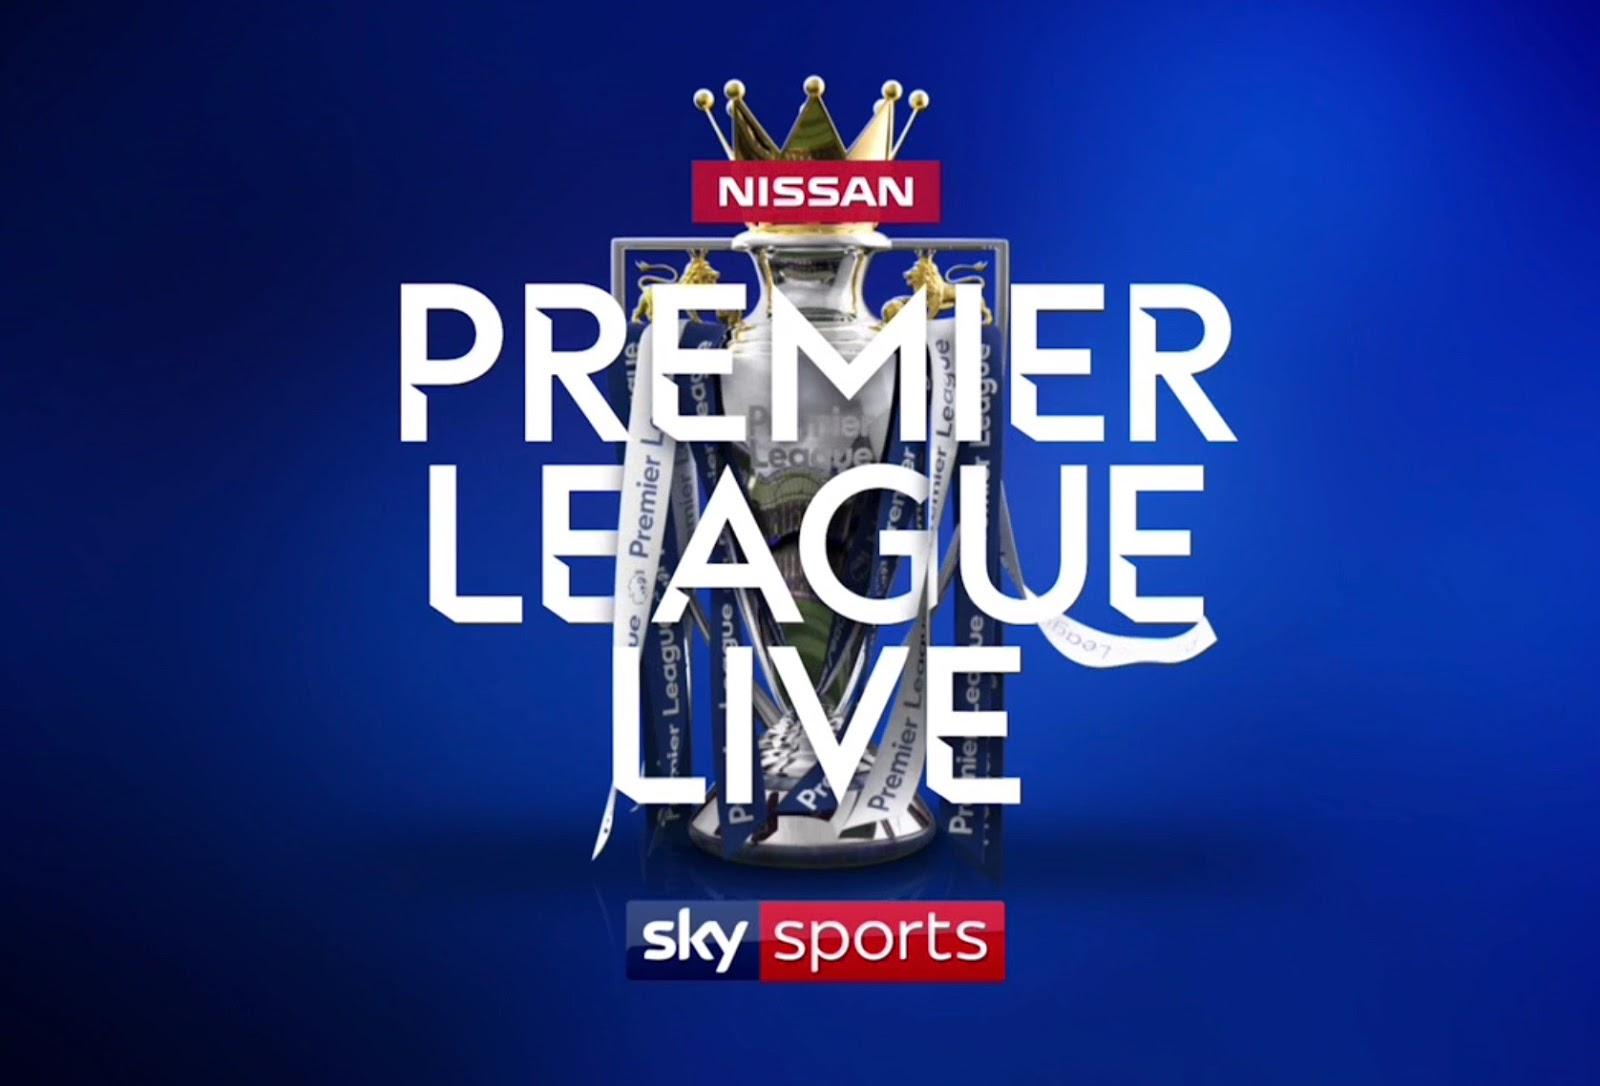 December Sky and BT Premier League LIVE games confirmed